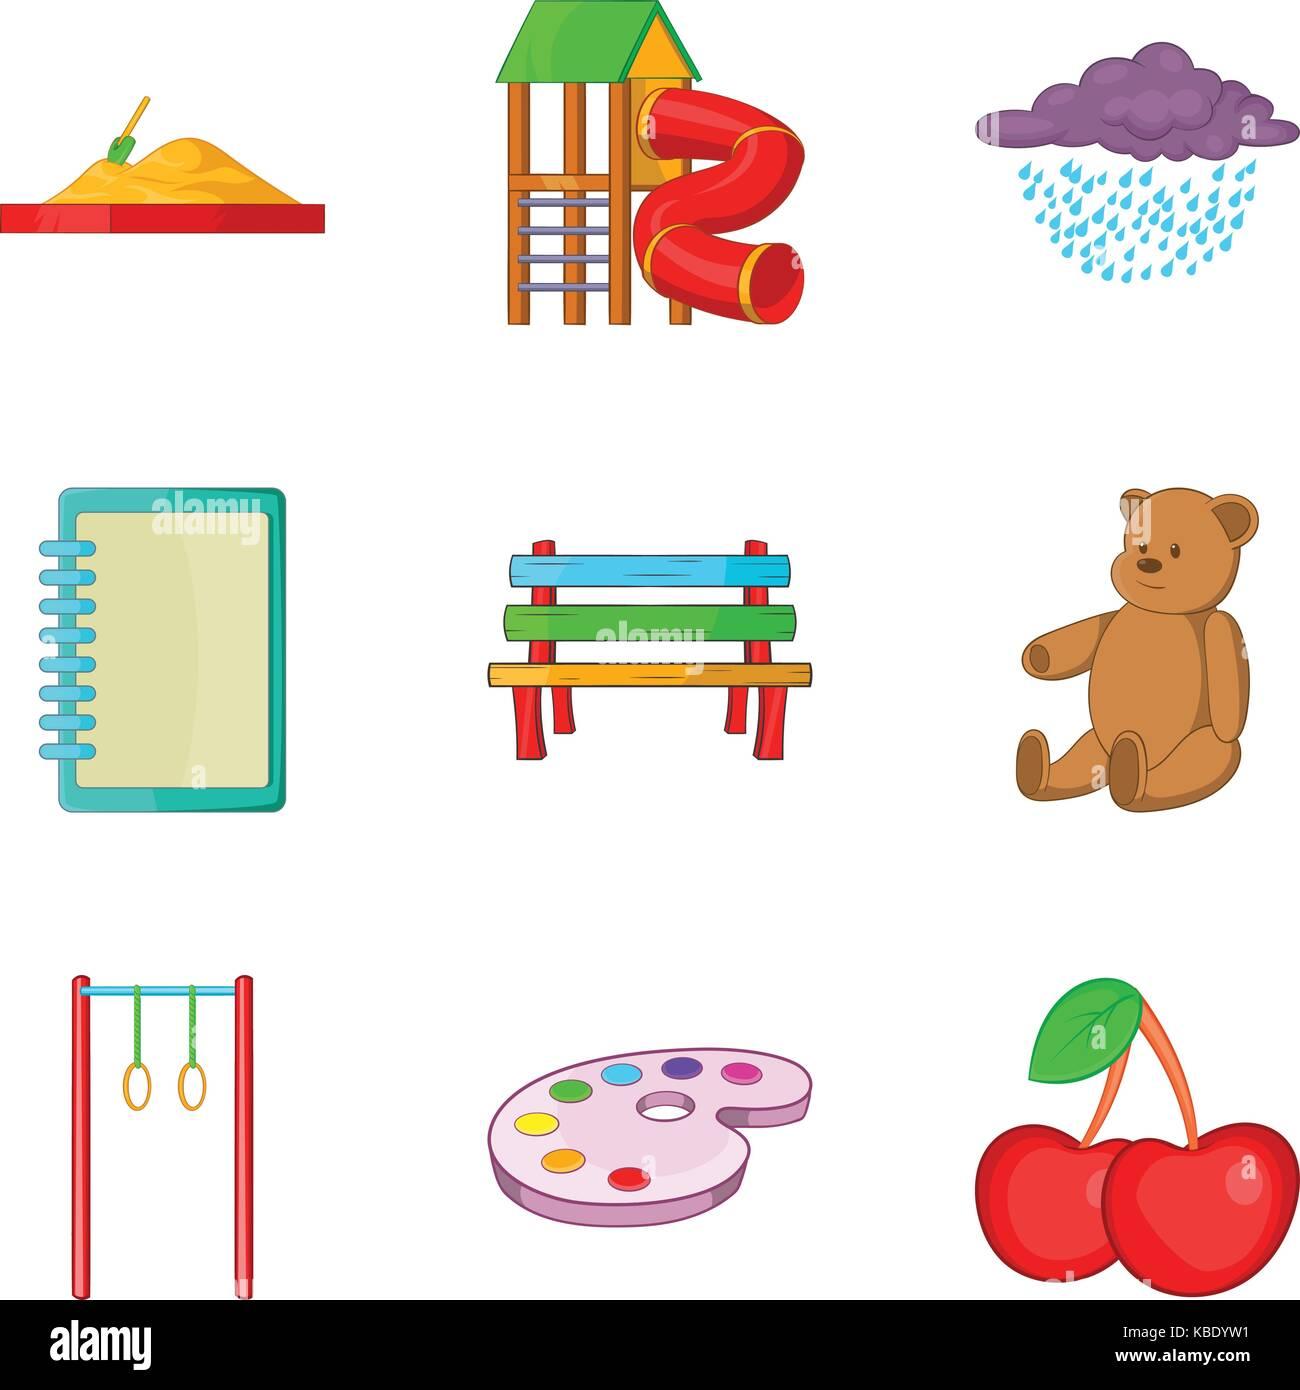 Meeting children icons set, cartoon style - Stock Image